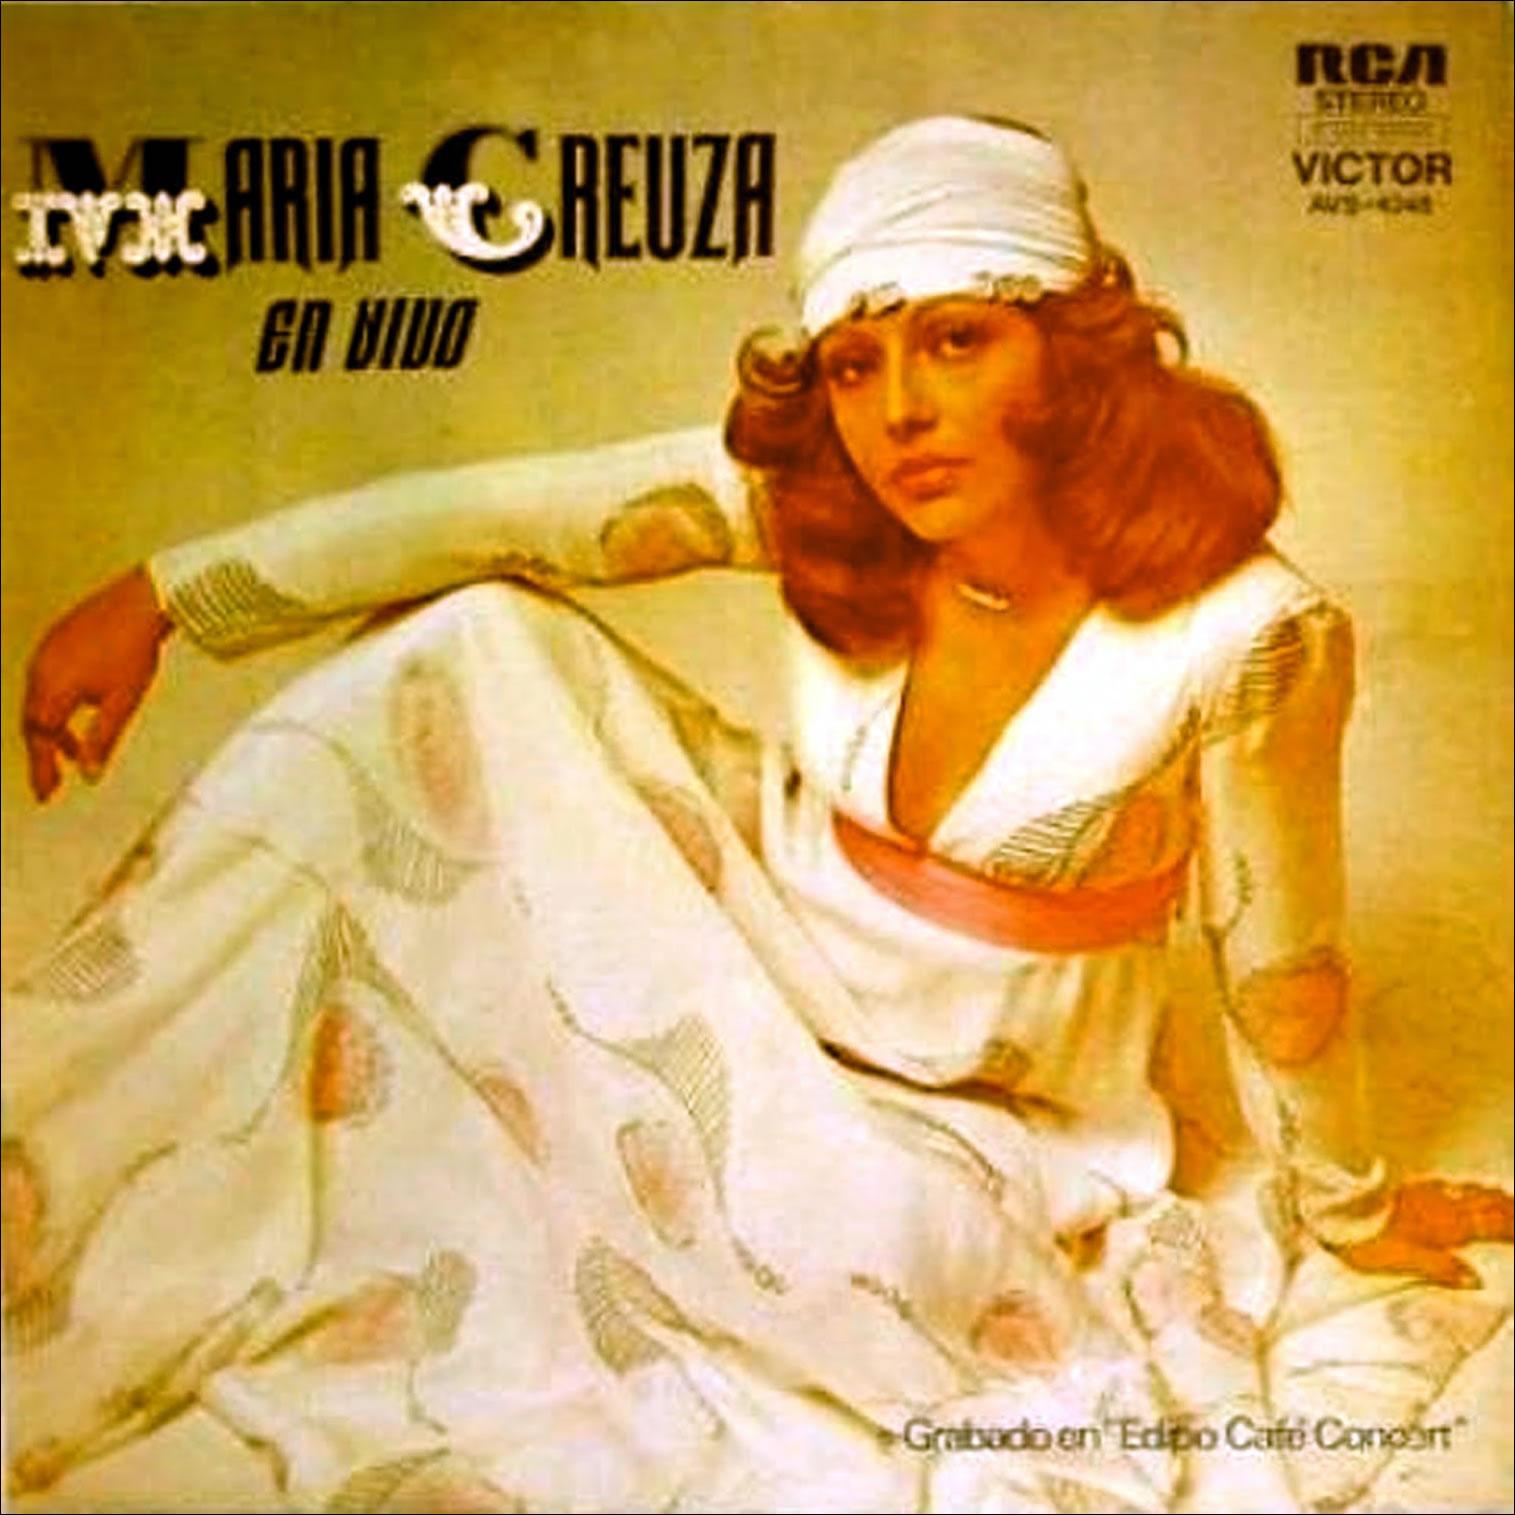 Maria Creuza - A Bahia